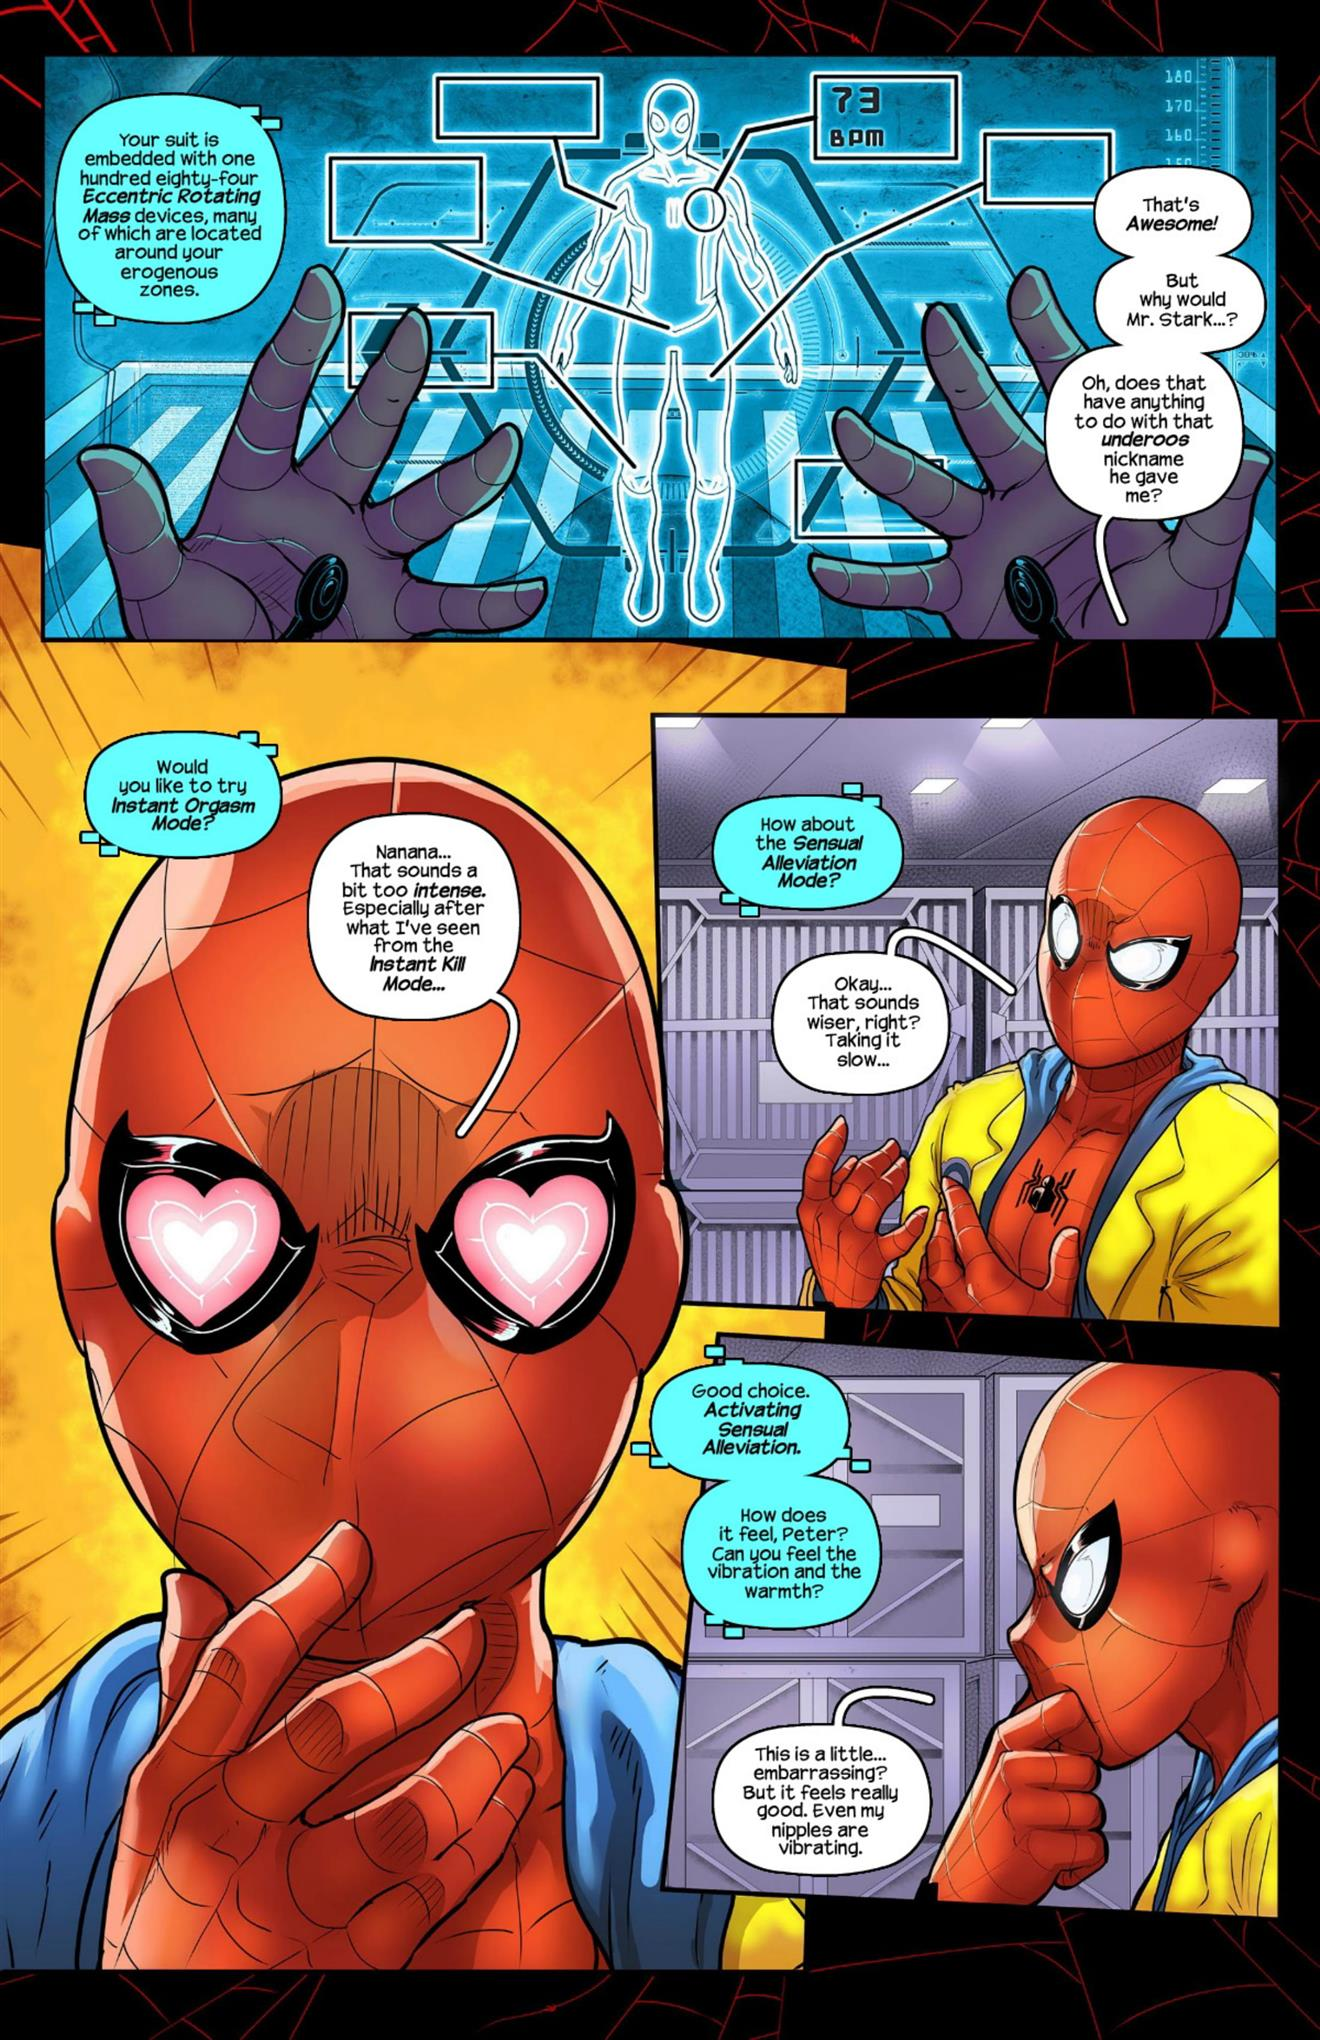 Haptics Protocol (Spider-Man) [Tracyscops] - Foto 4